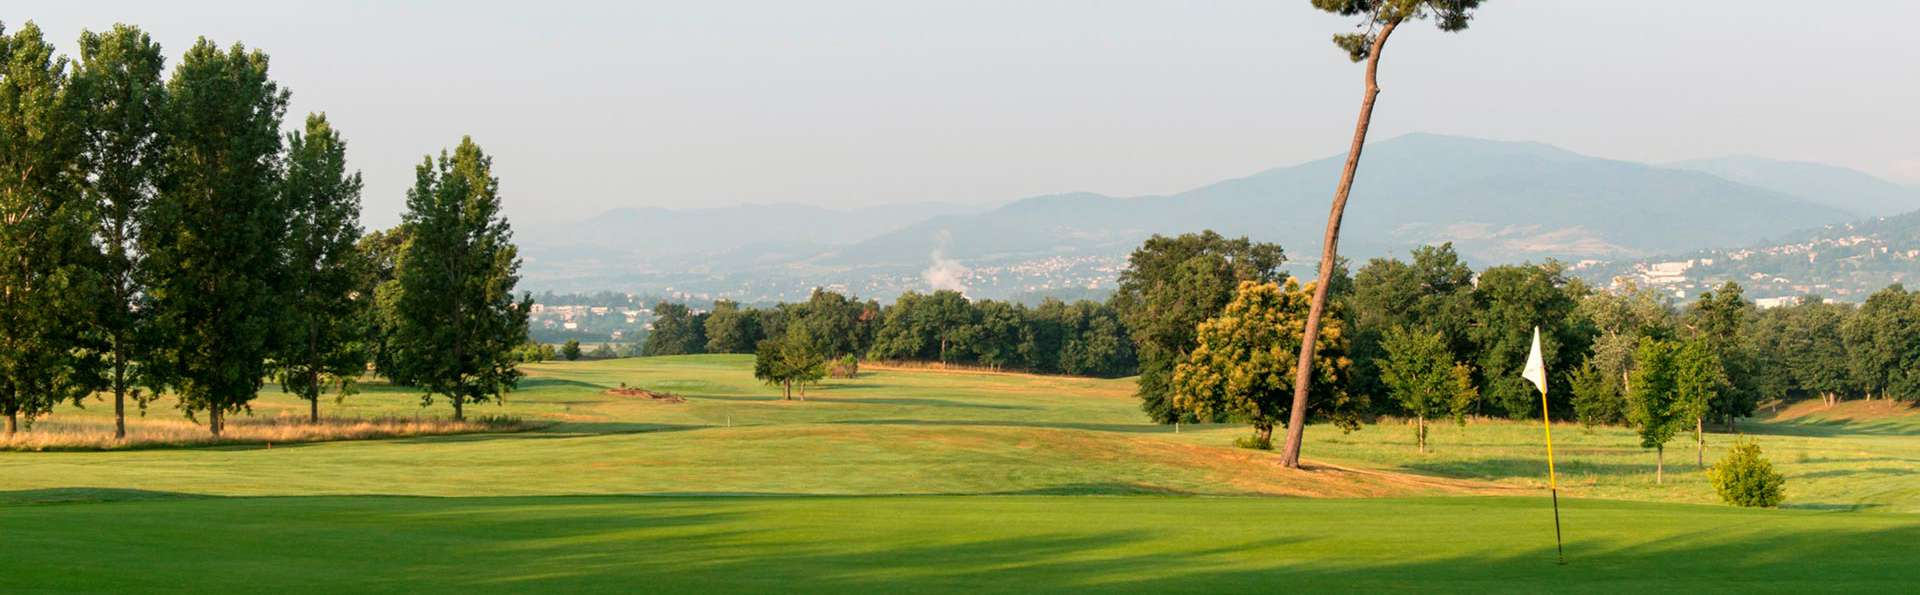 Domaine de Saint- Clair - edit_golf2.jpg